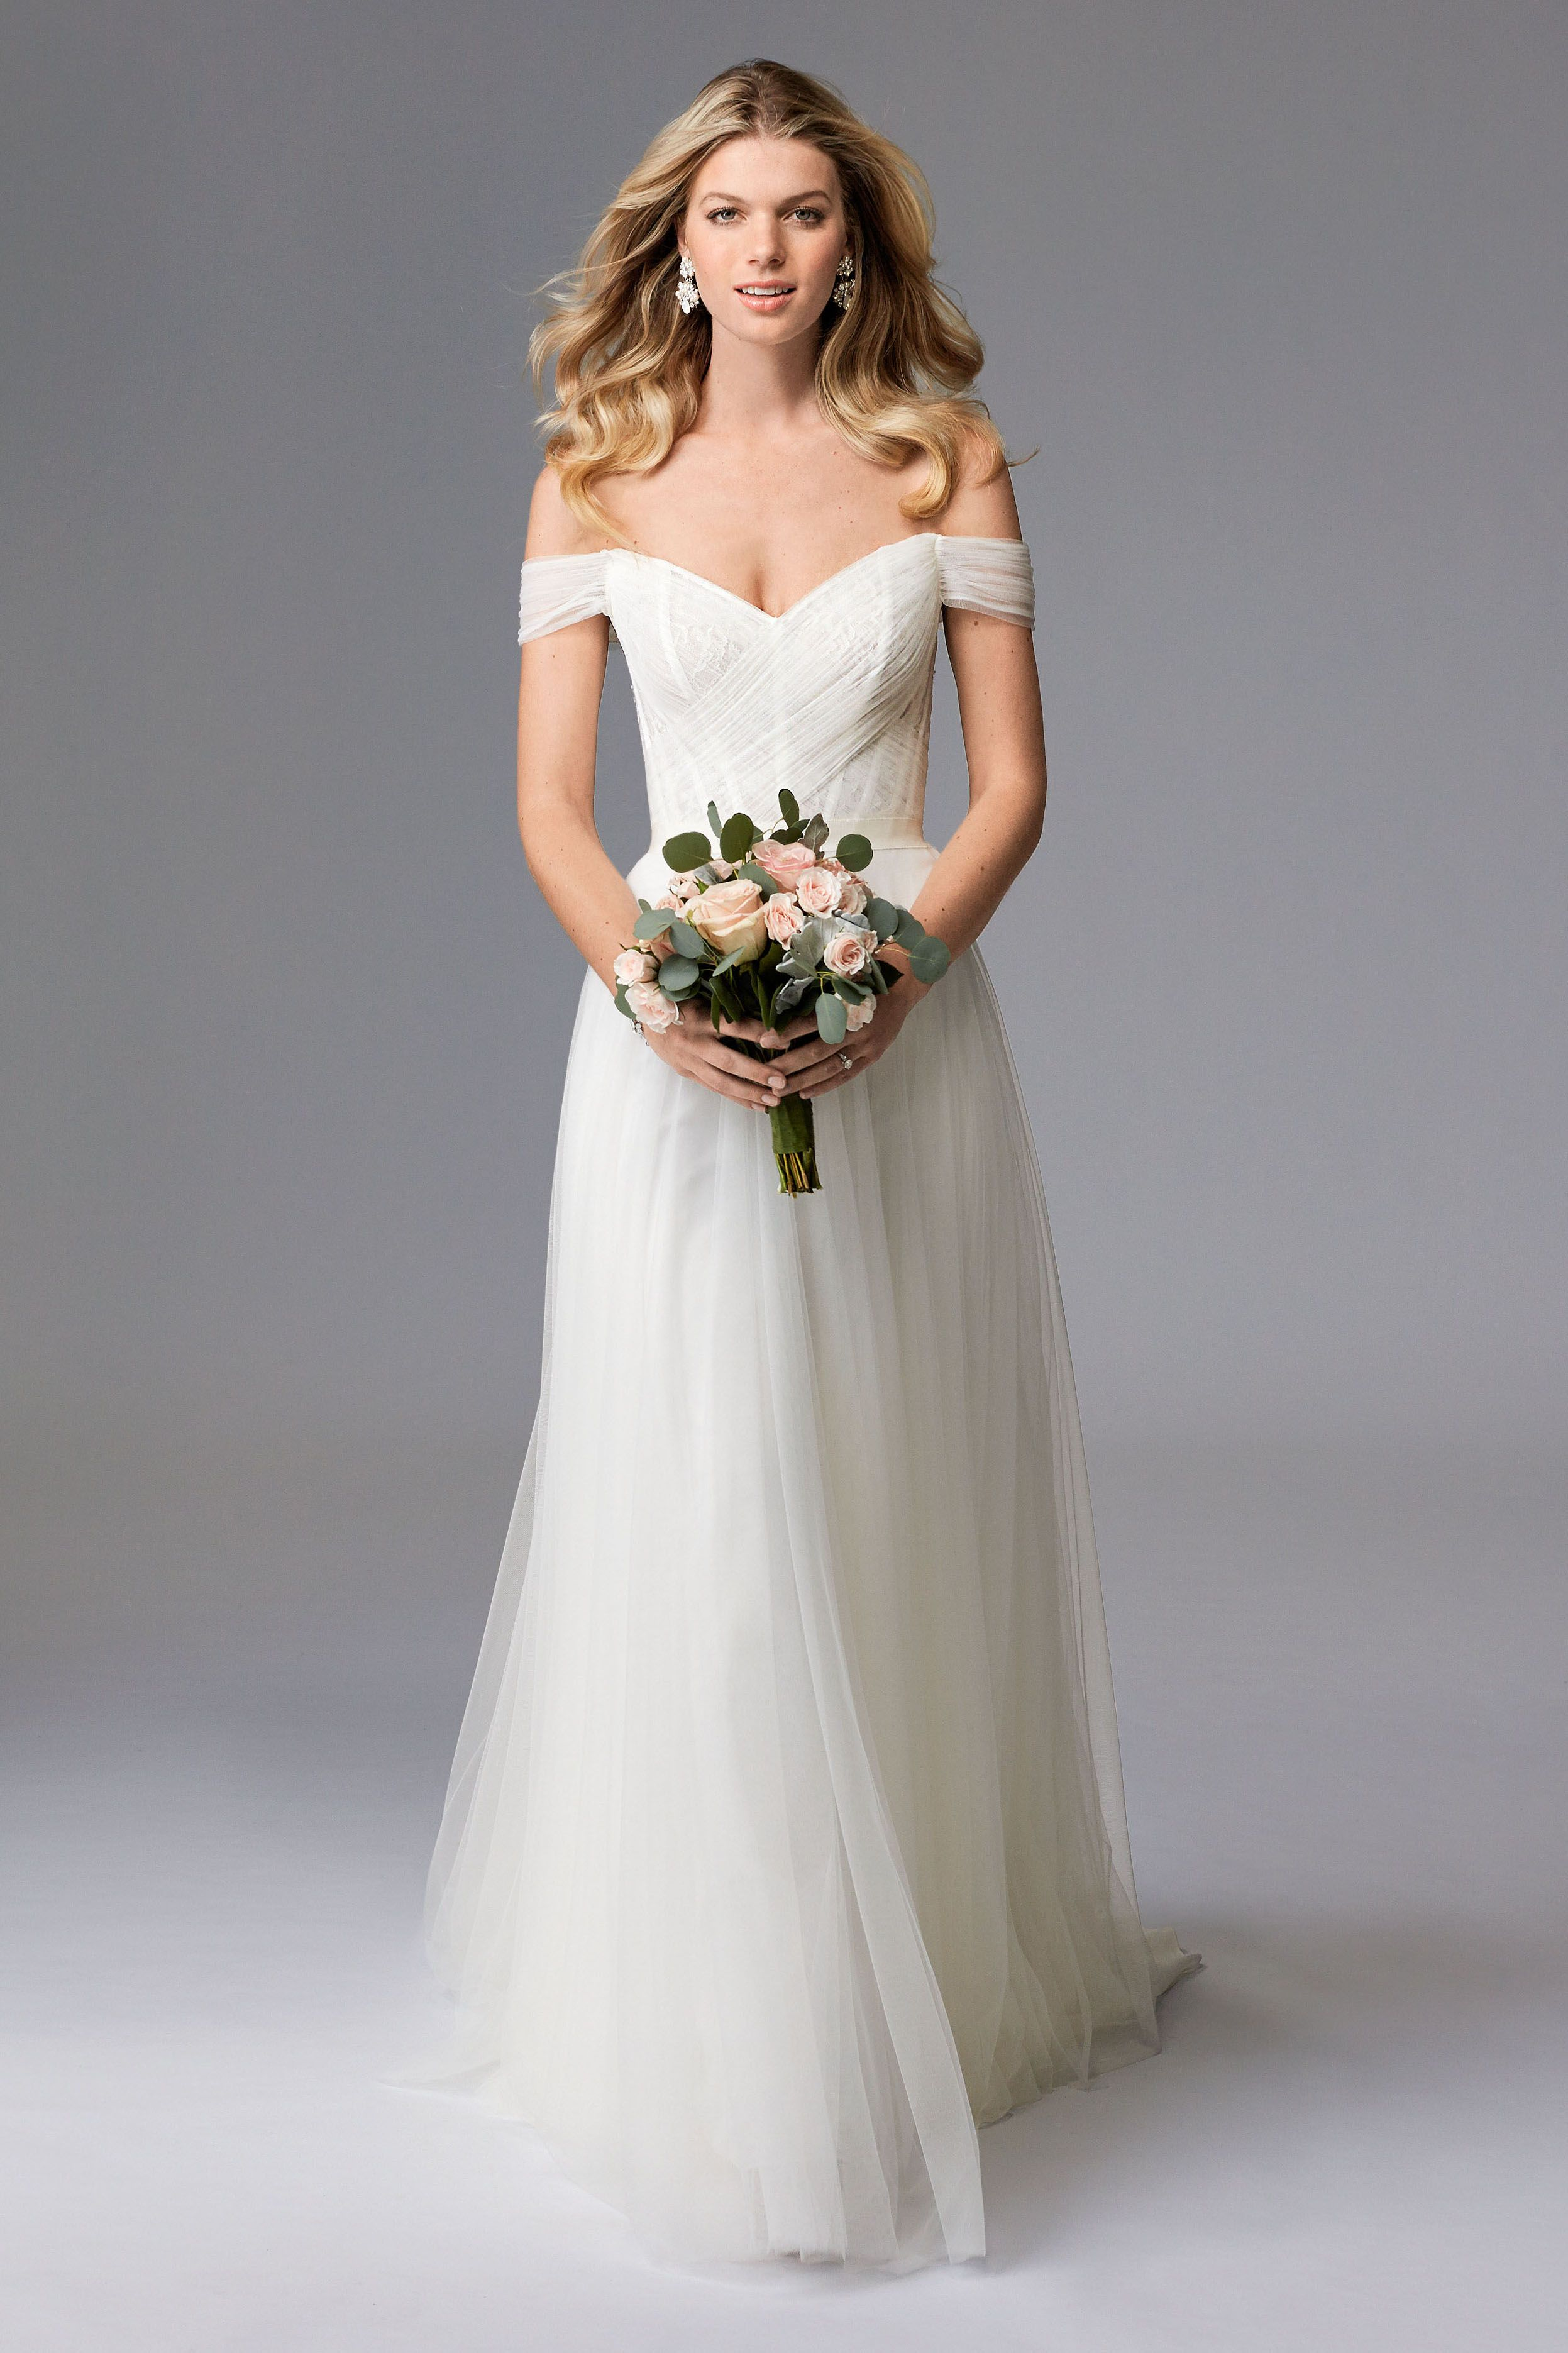 Bonafidebride diy project sweet whimsical paper lanterns -  Watterswtoo Wtoo Style 17757 Heaton Wedding Gown